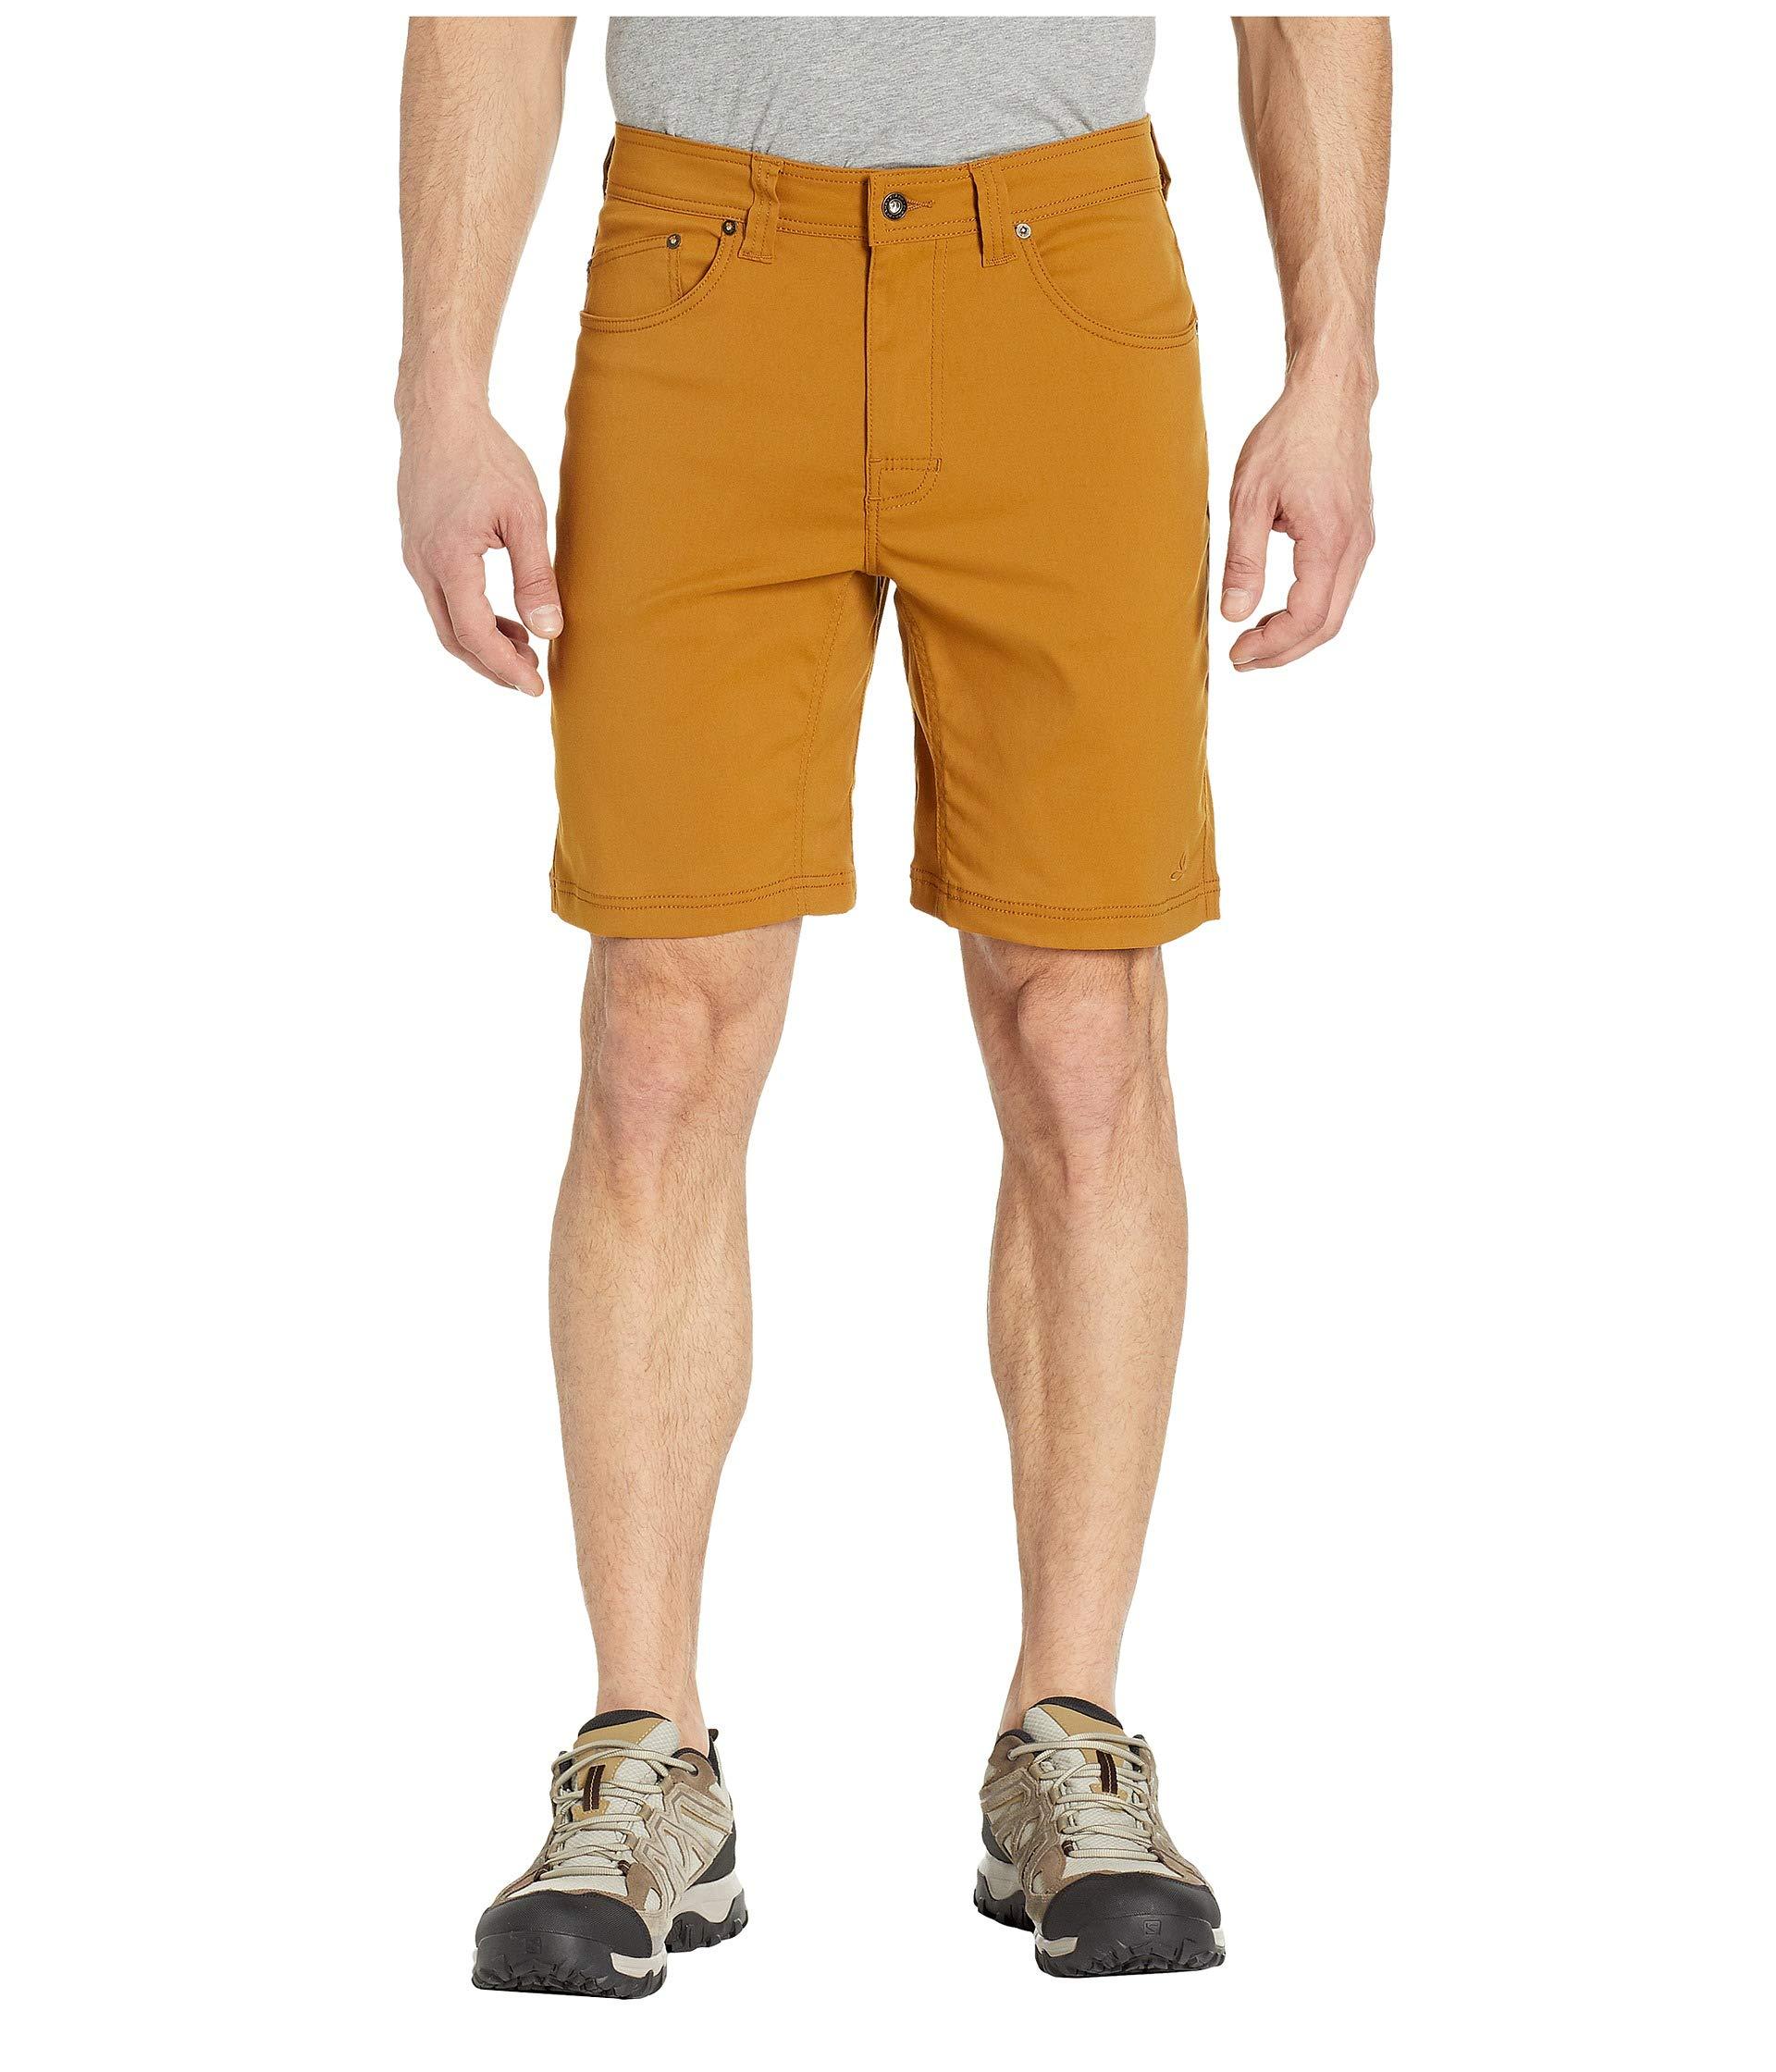 prAna Men's Brion Shorts, Bronze, 28W 9L